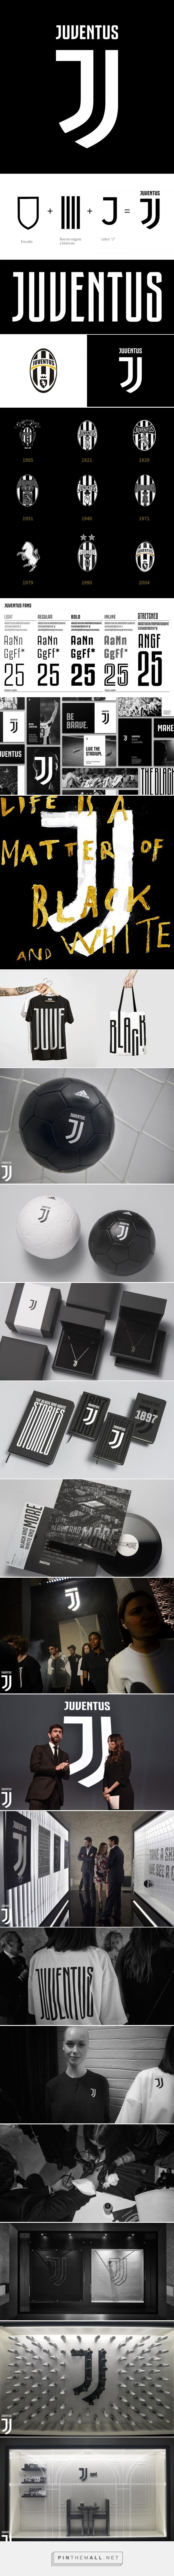 Branding for Juventus Football Club by Interbrand (2017)